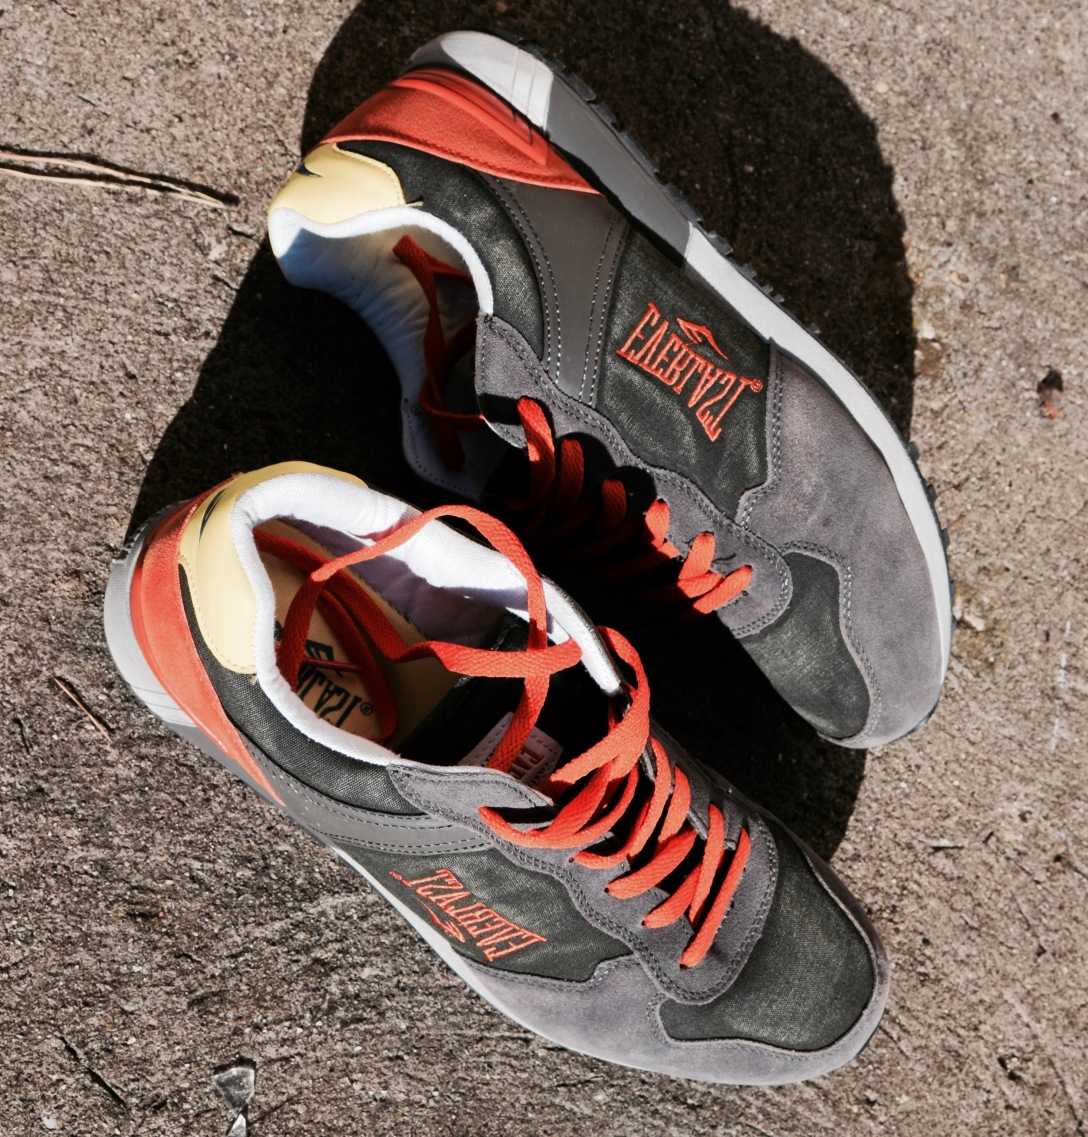 sneakers, runners, kicks, sneakeraddict, shoes, everlast